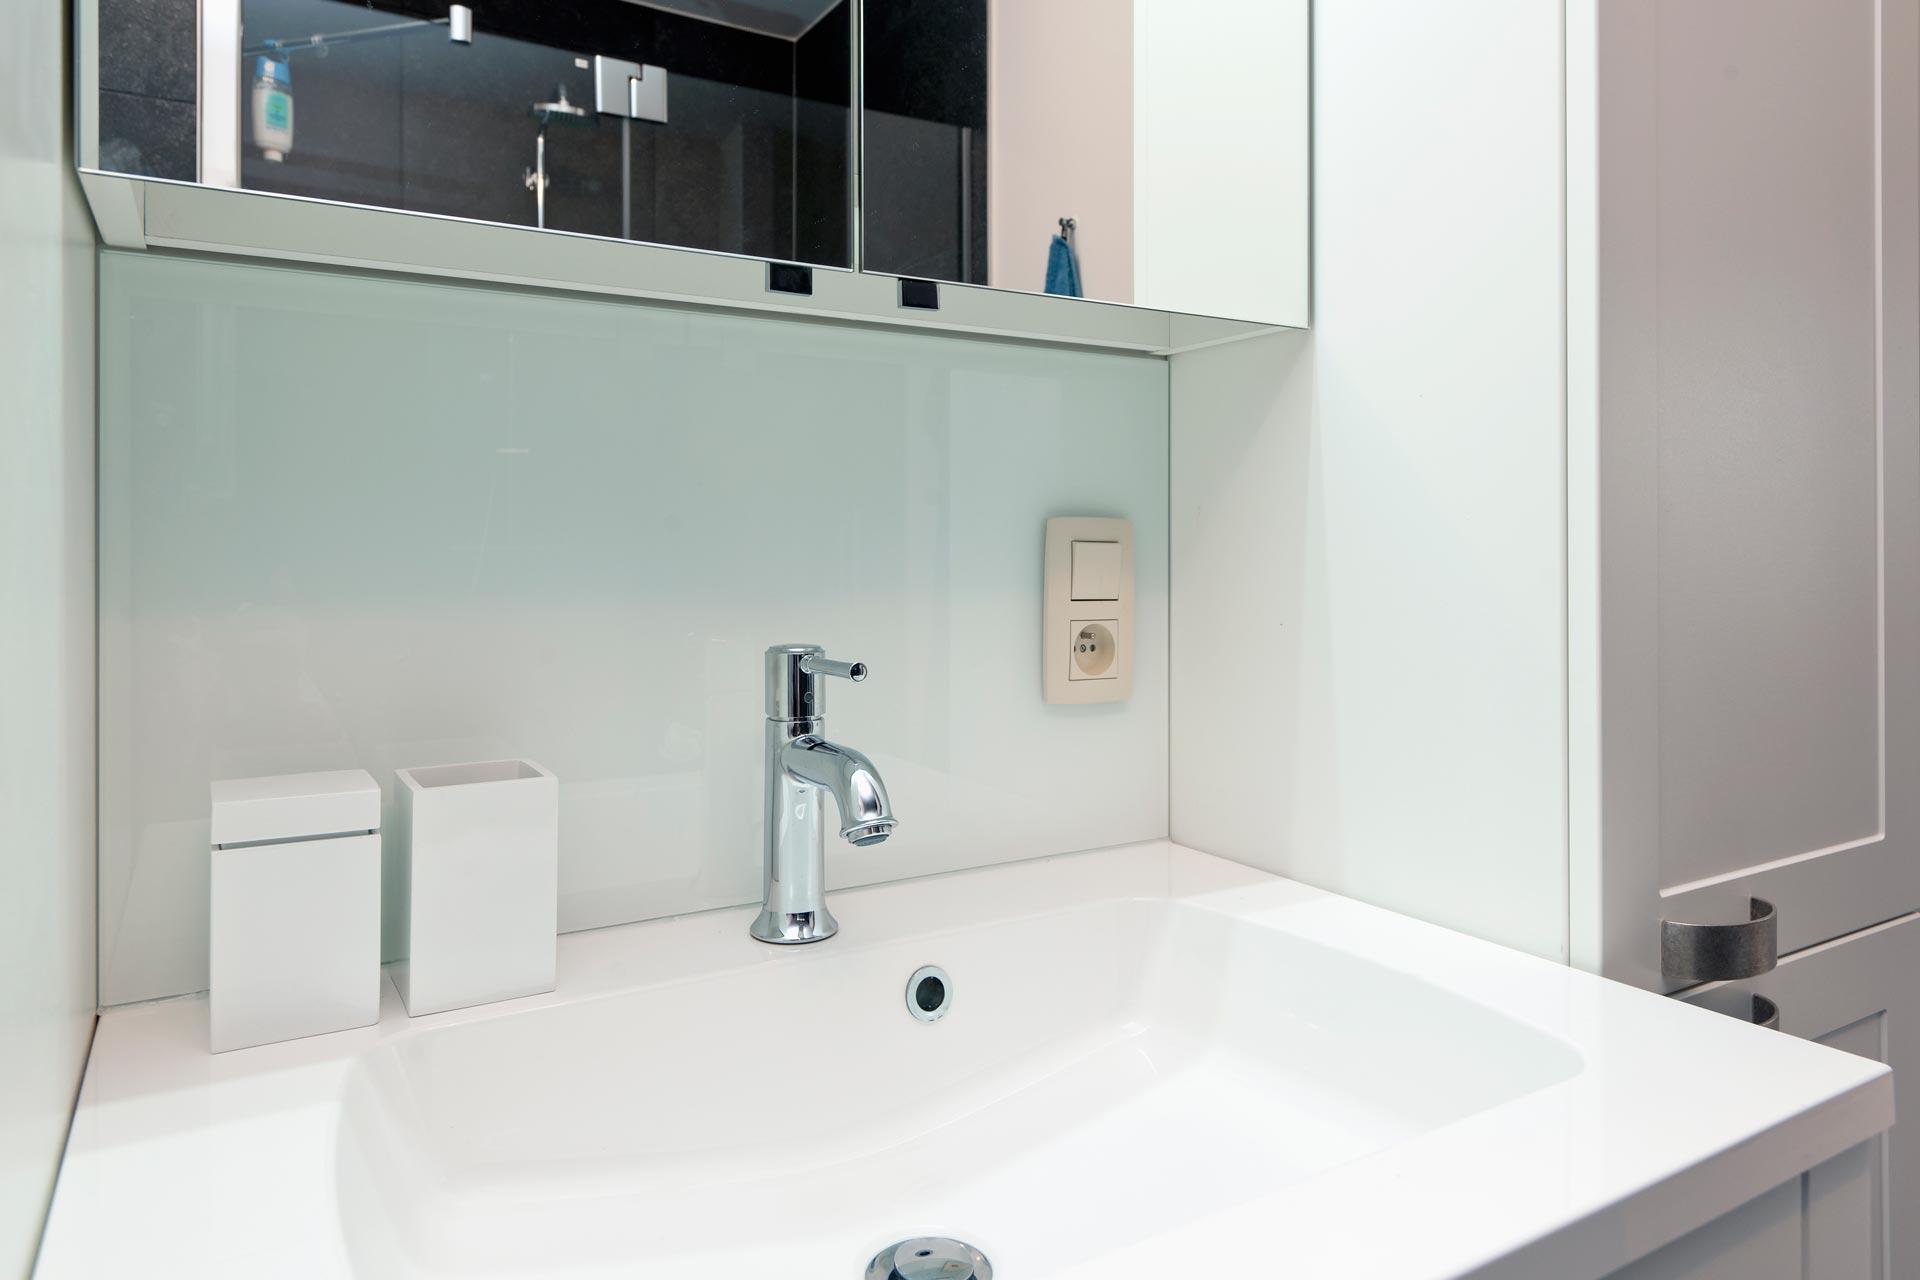 Badkamer tegels ceramico wandtegels keuken verven klassieke of ouderwetse tegels badkamer - Keuken porcelanosa ...